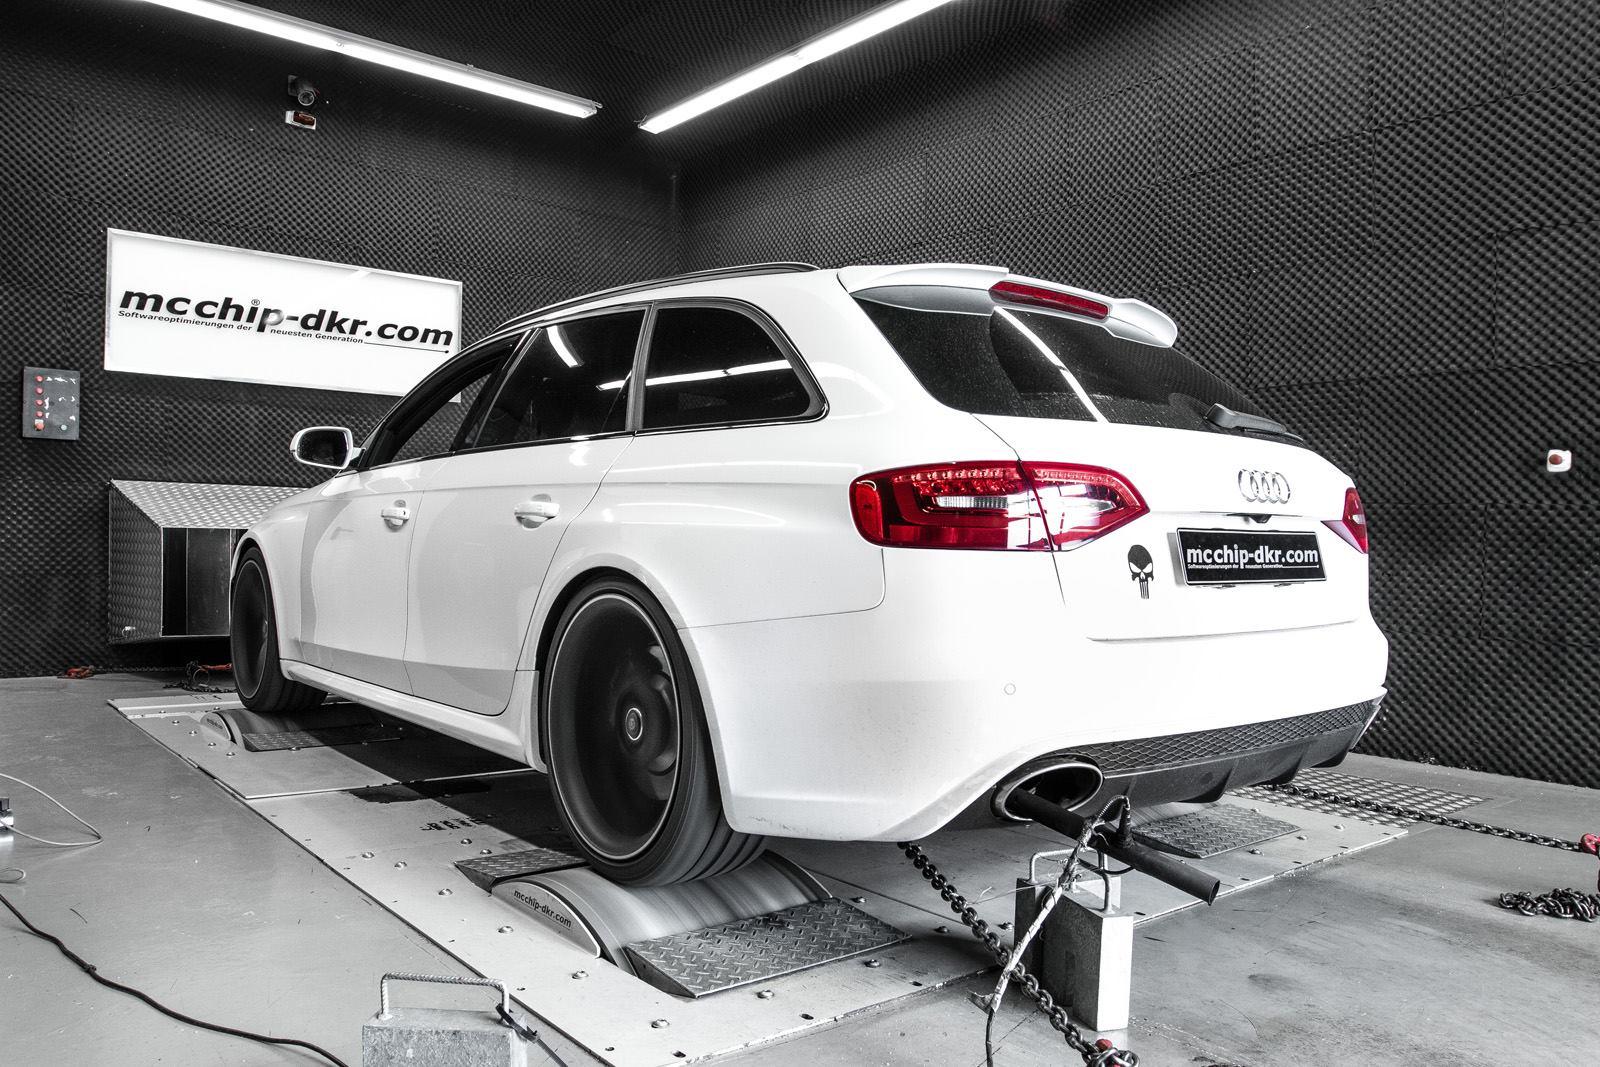 Audi Rs4 Gets 580 Hp Thanks To Whipple Kompressor